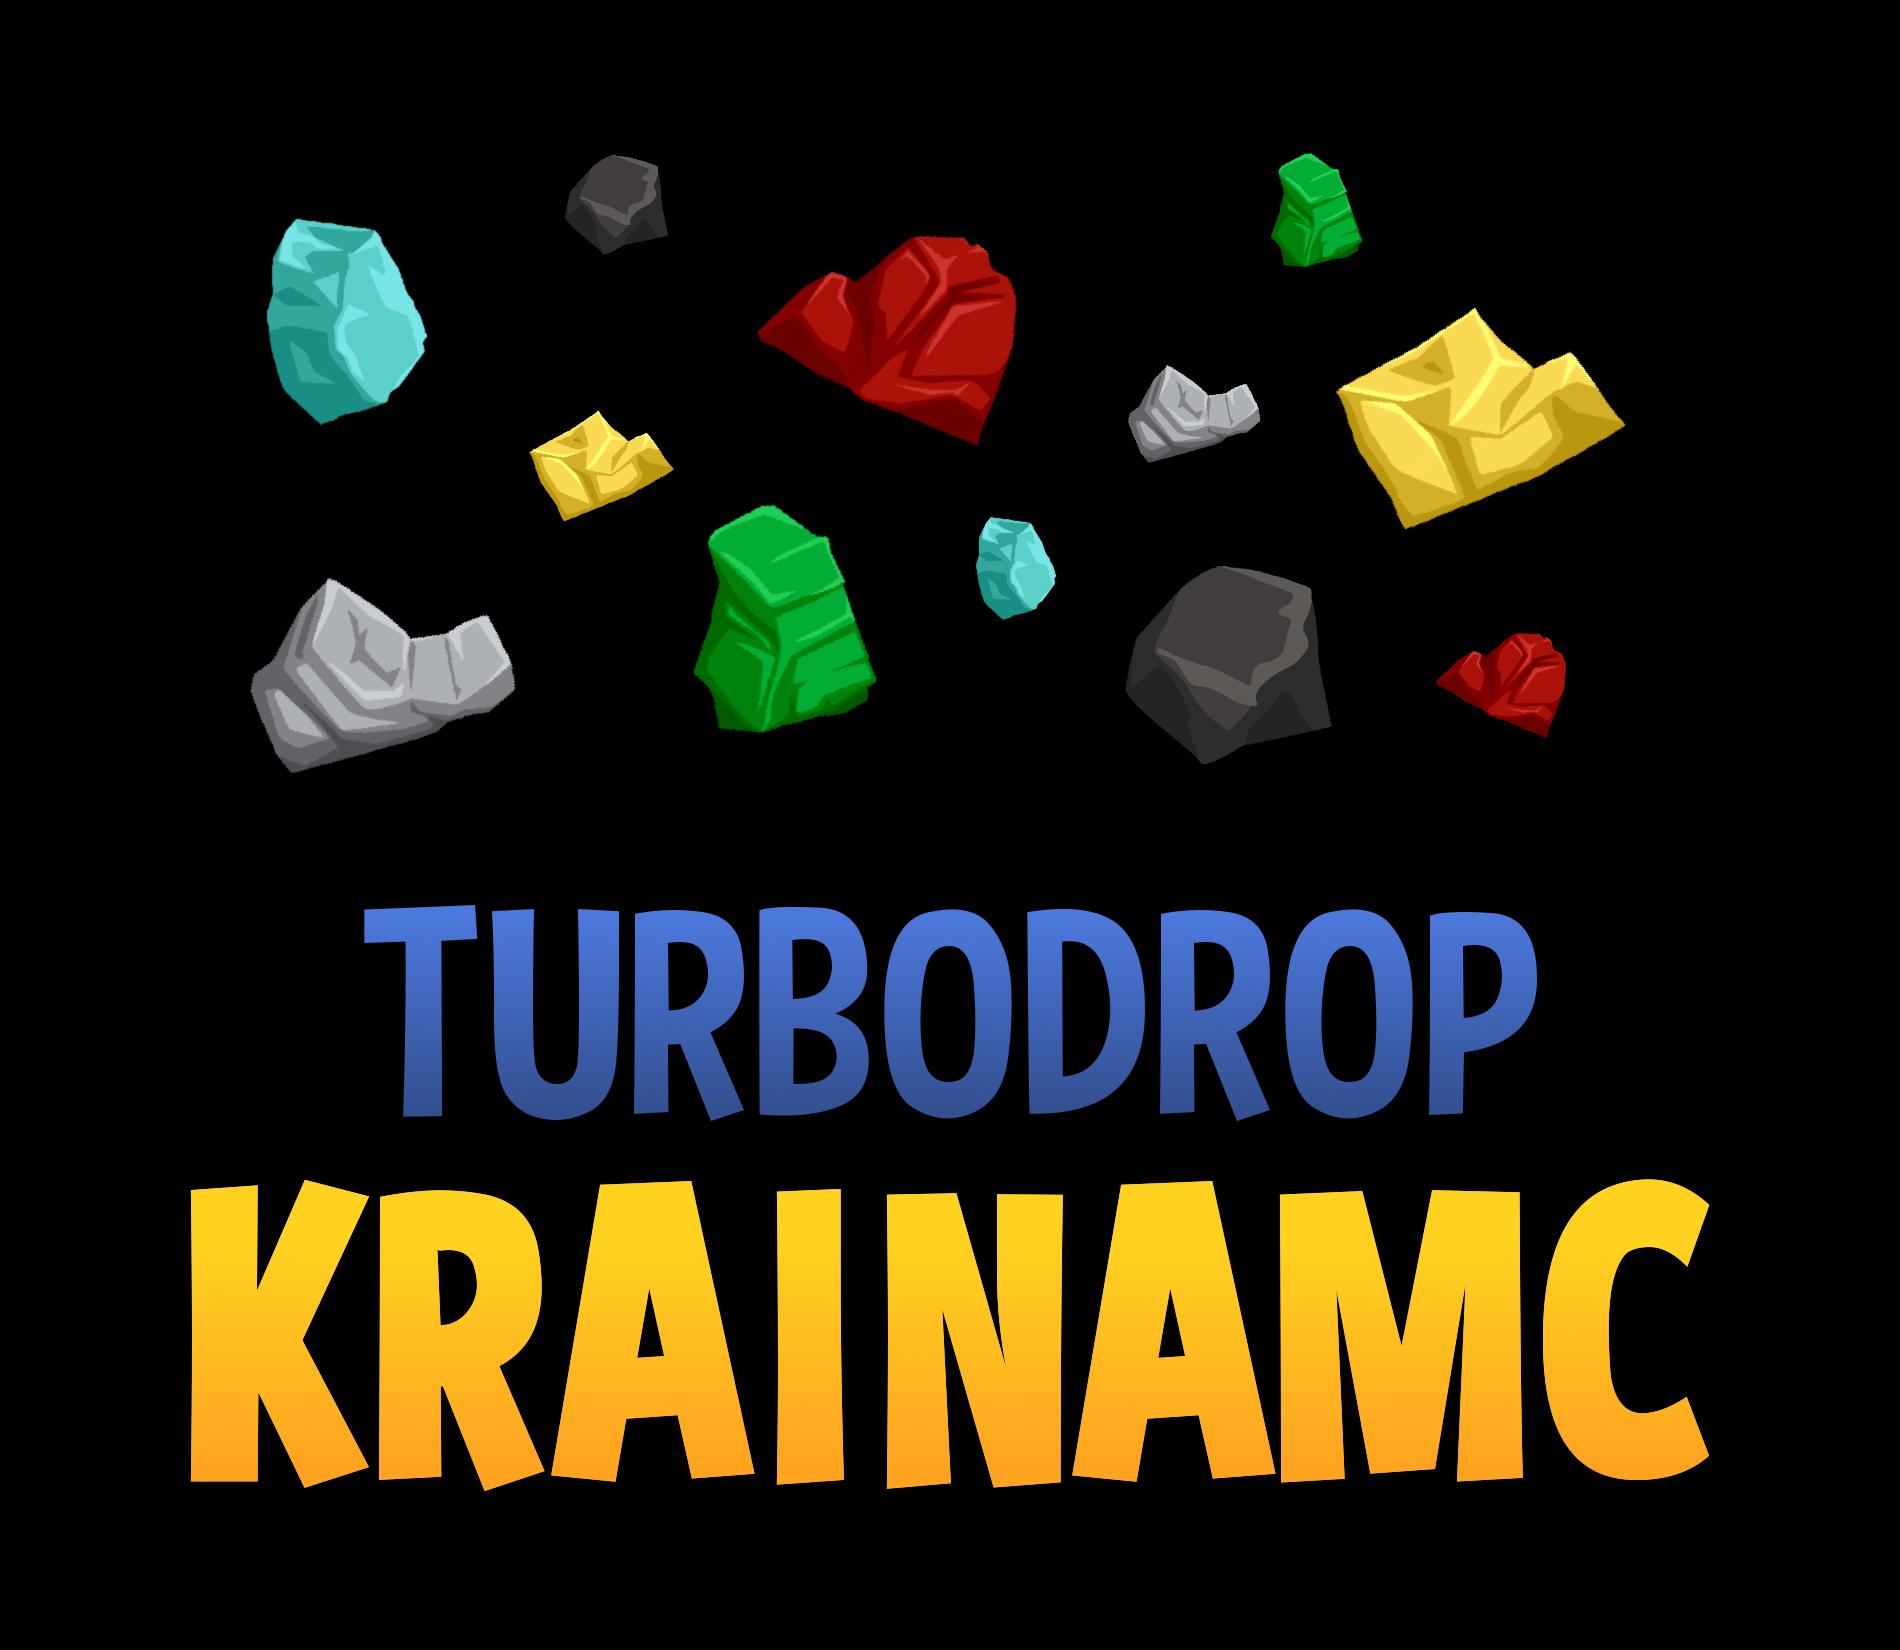 Turbodrop (1 godz)